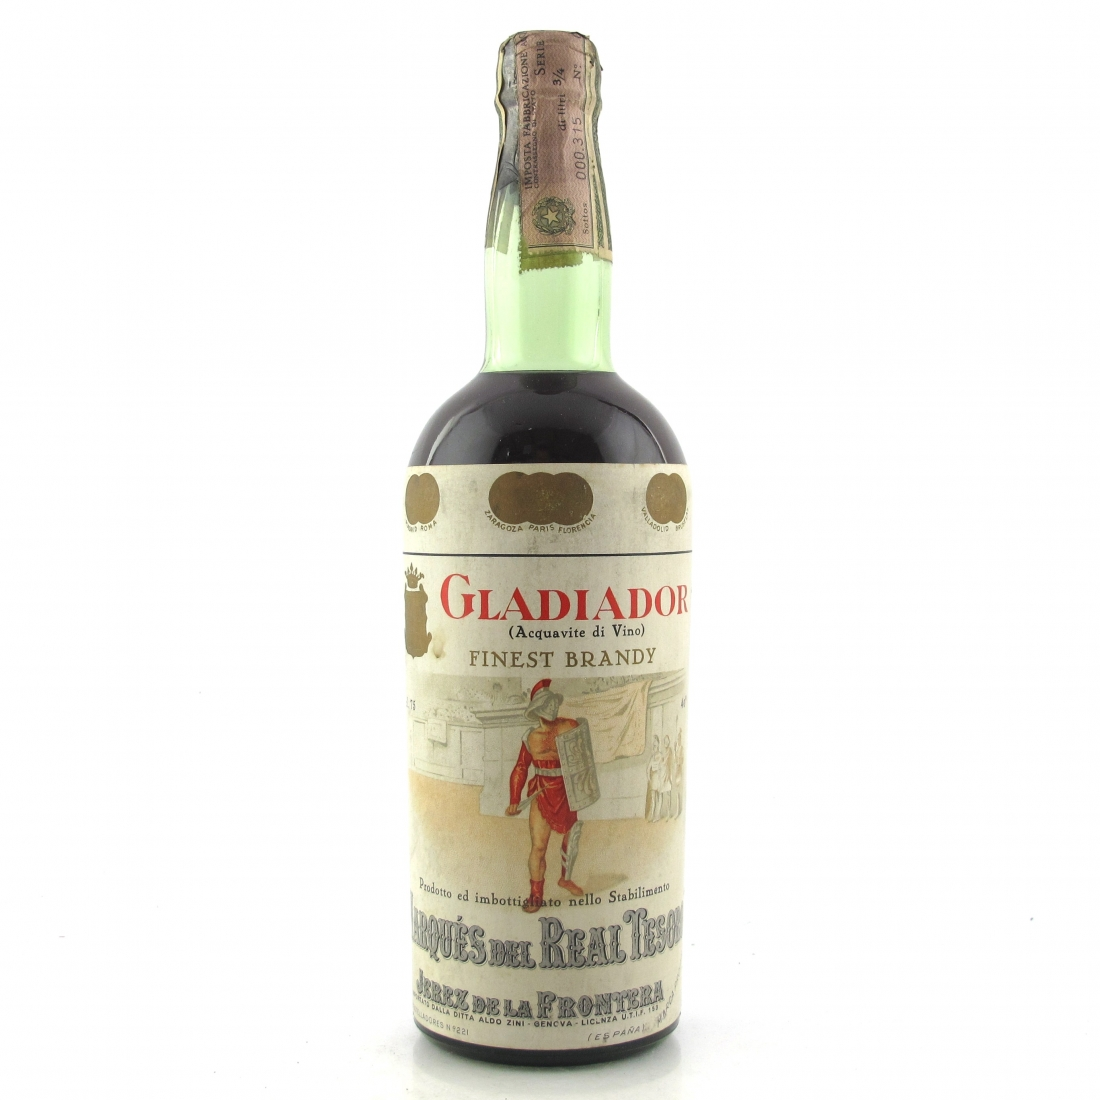 Gladiator Finest Brandy 1960s